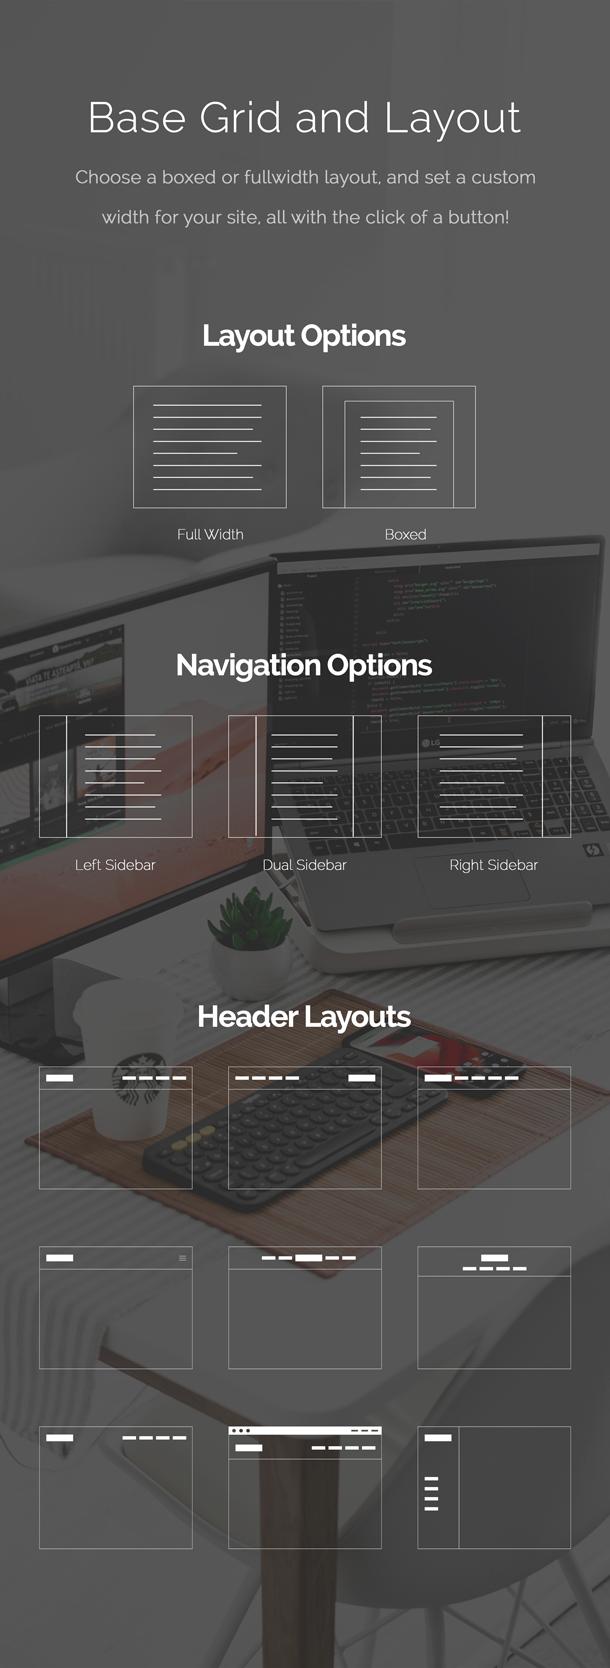 presentation-layout-gg7Tk.png